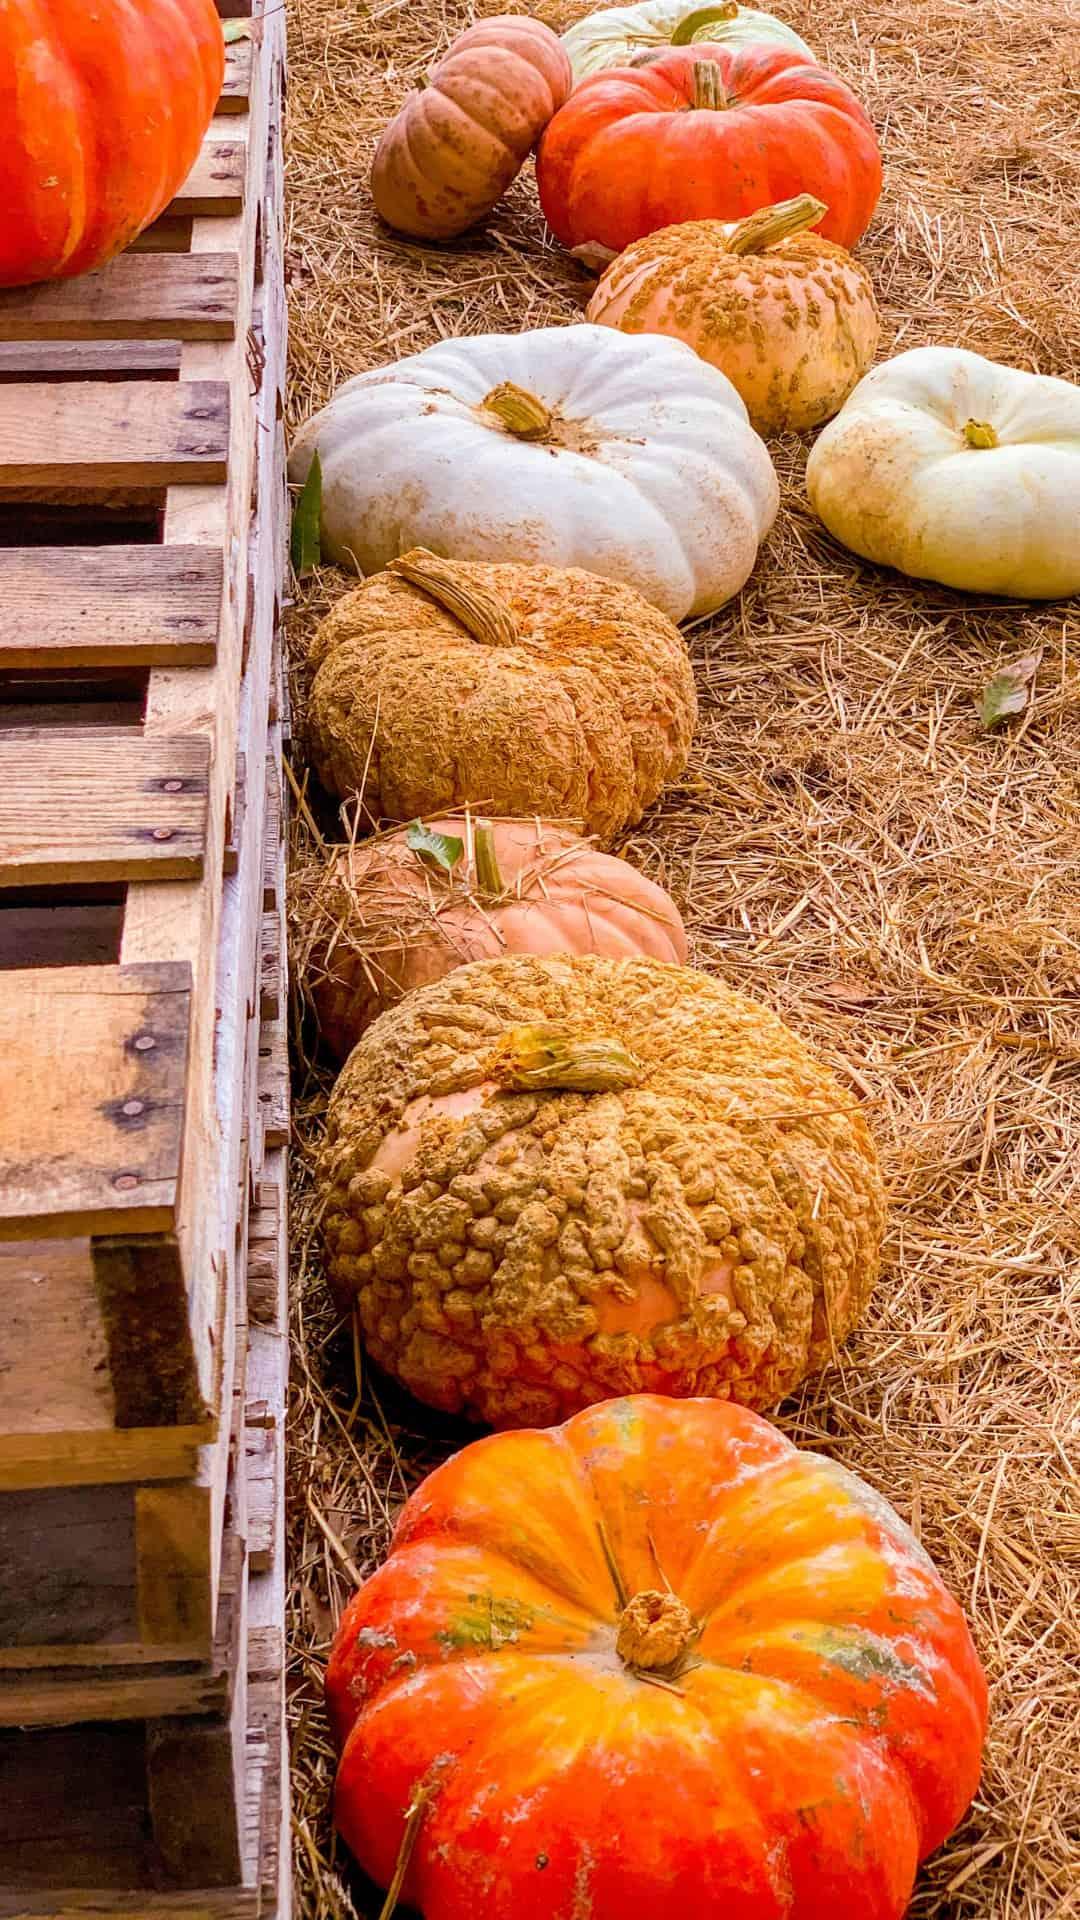 Autumn Wallpaper iPhone Aesthetic Fall Pumpkins